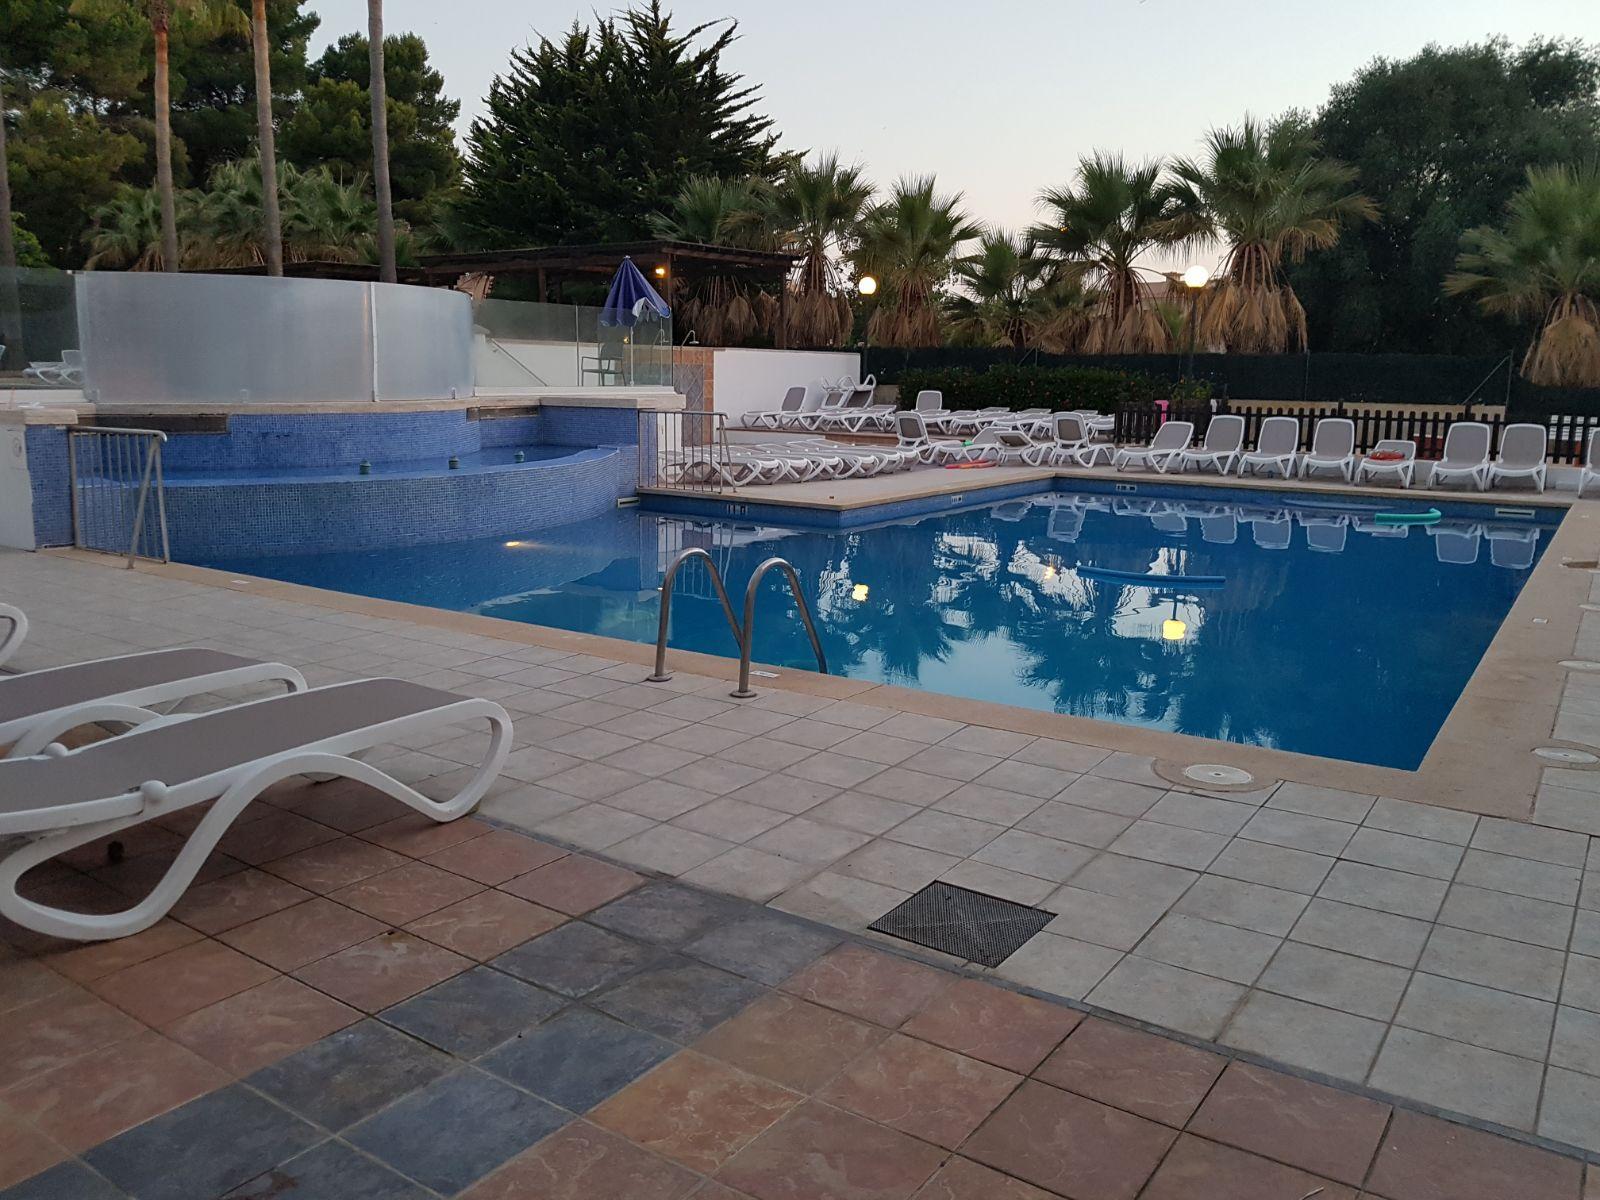 Schwimmbad 1,60m